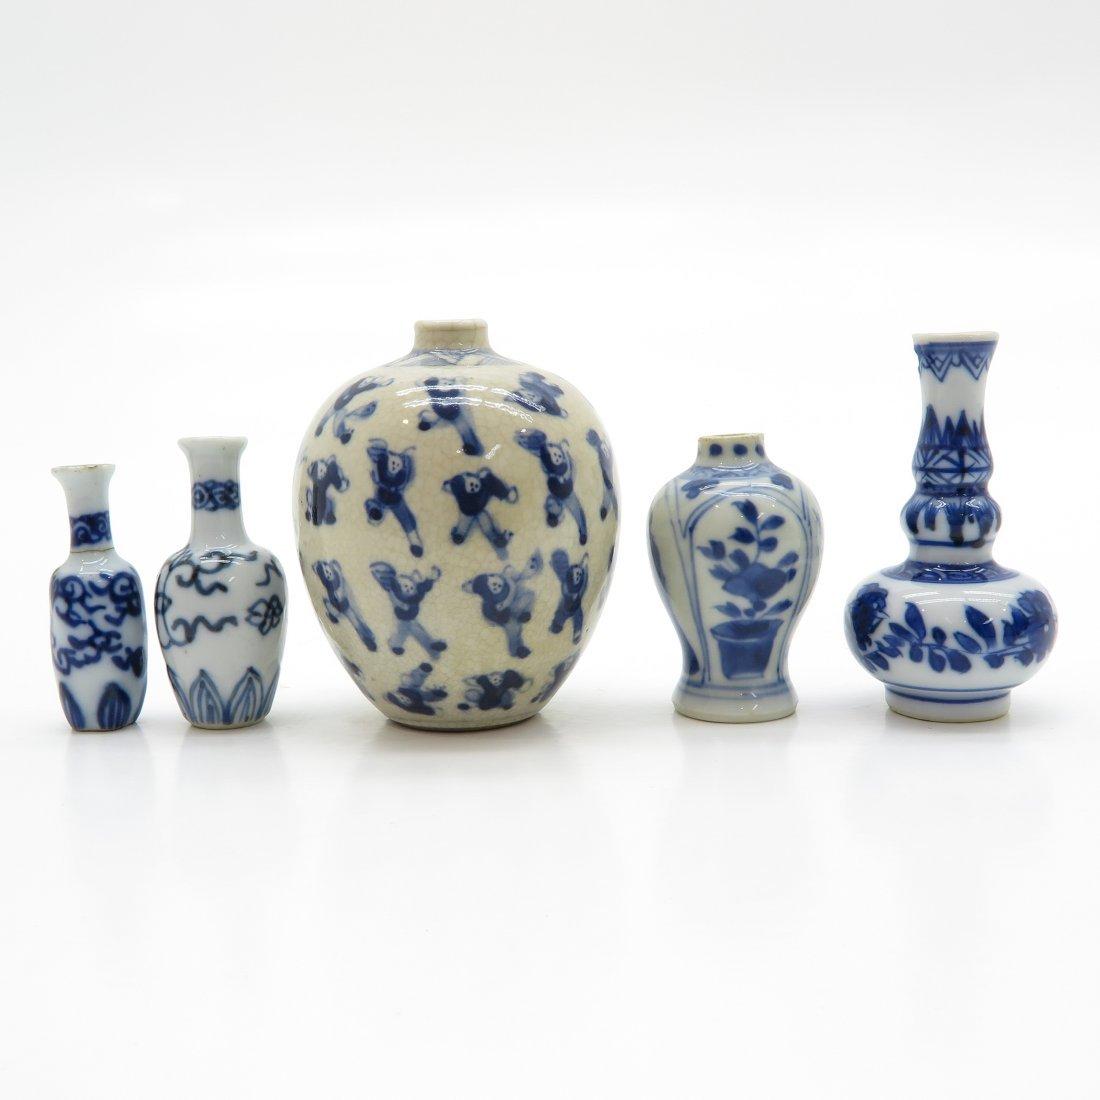 Diverse Lot of China Porcelain - 4